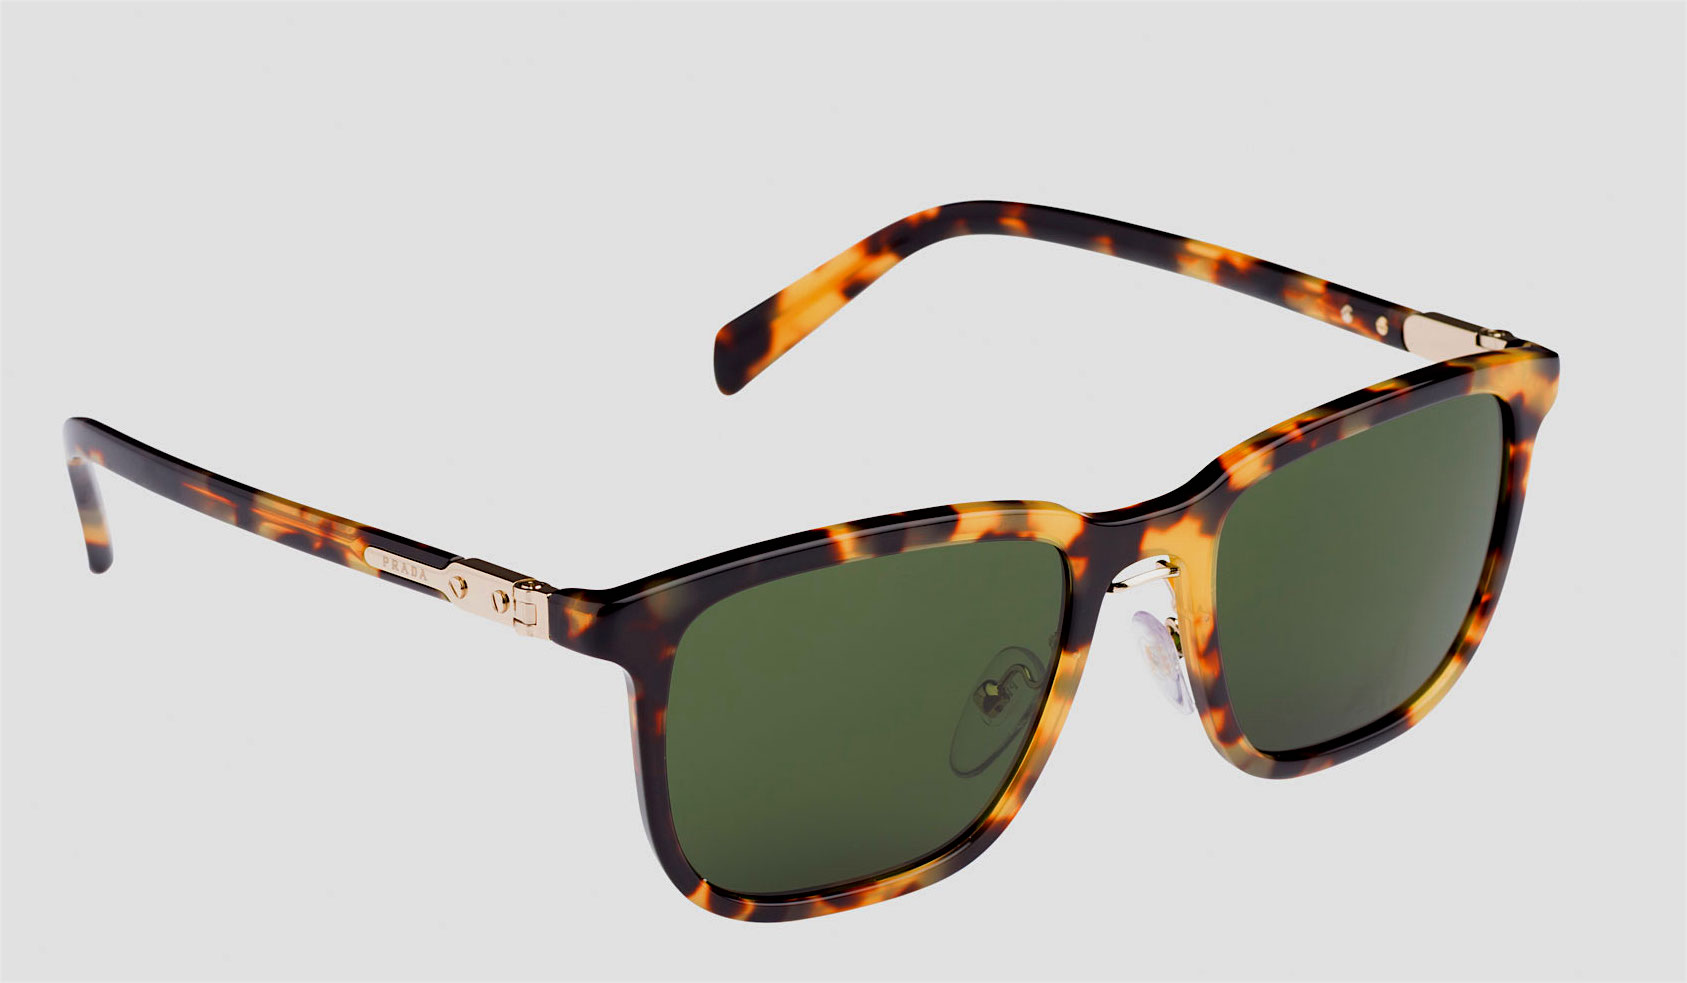 Men's large square acetate sunglasses. Flat lenses